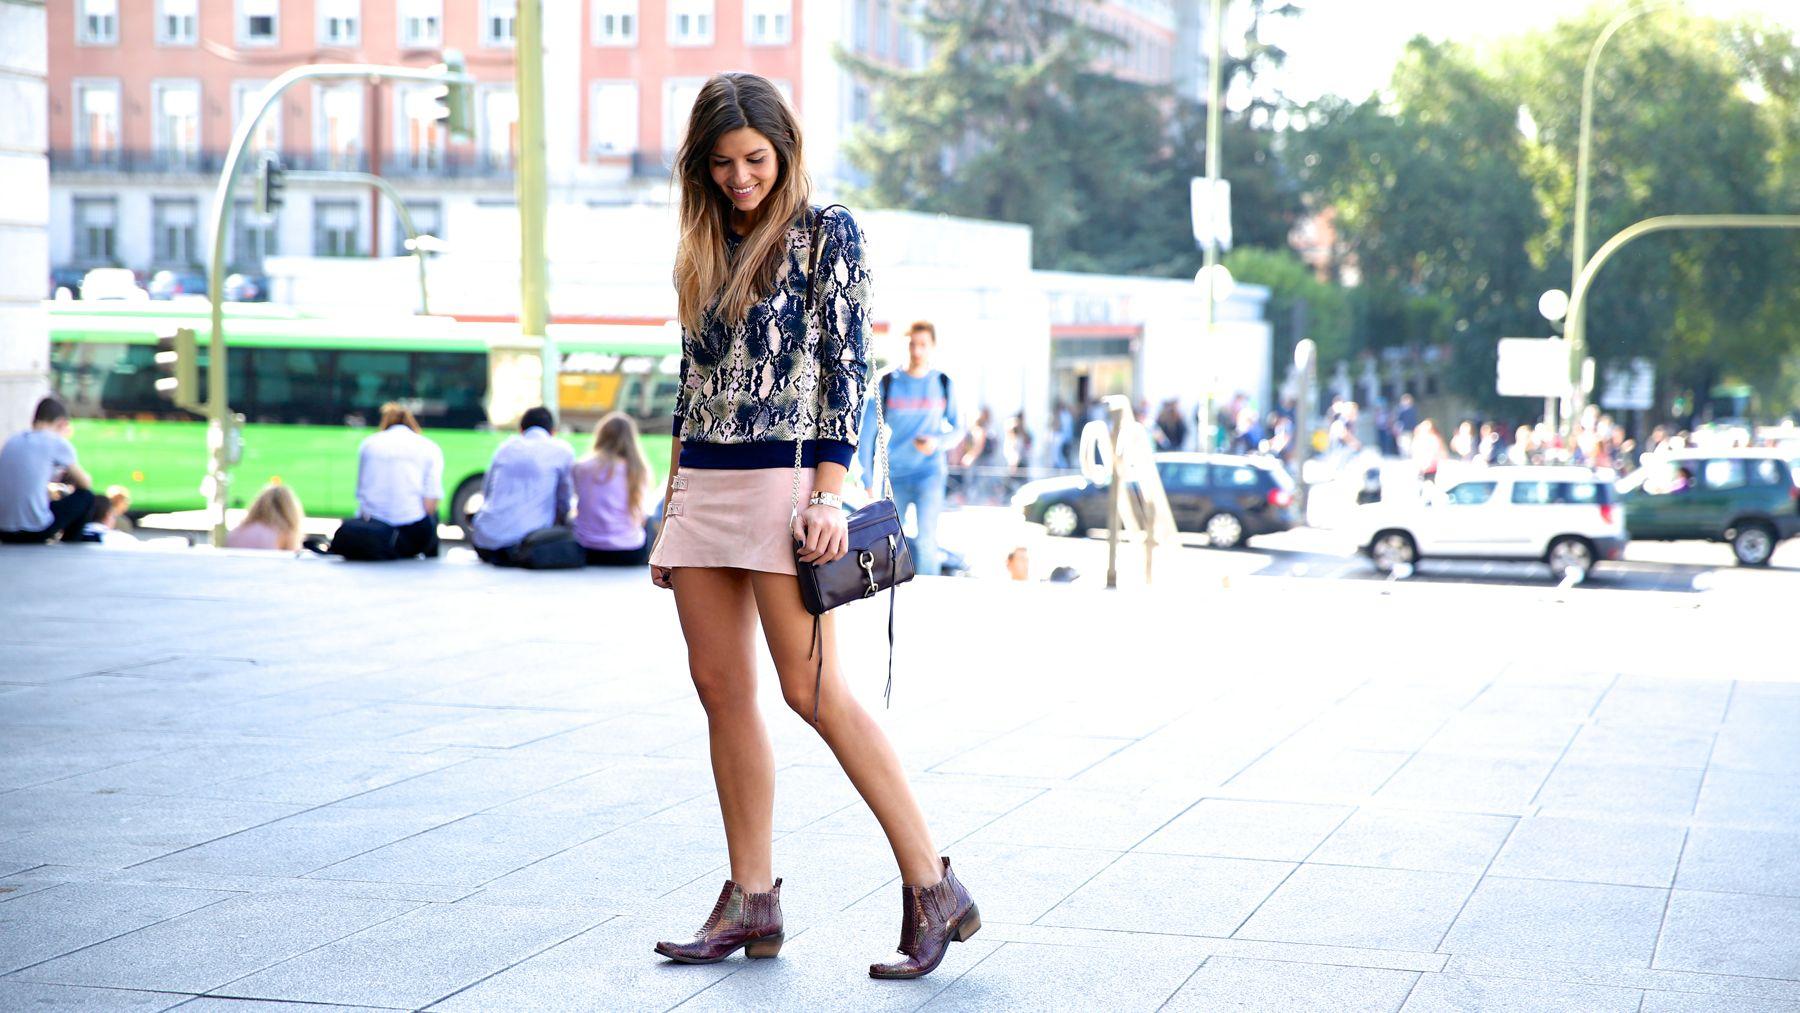 trendy_taste-look-outfit-street_style-ootd-blog-blogger-fashion_spain-moda_españa-girissima.com-sweatshirt-sudadera-estampado-crocodile-cocodrilo-botines-booties-pink_skirt-falda_rosa-6